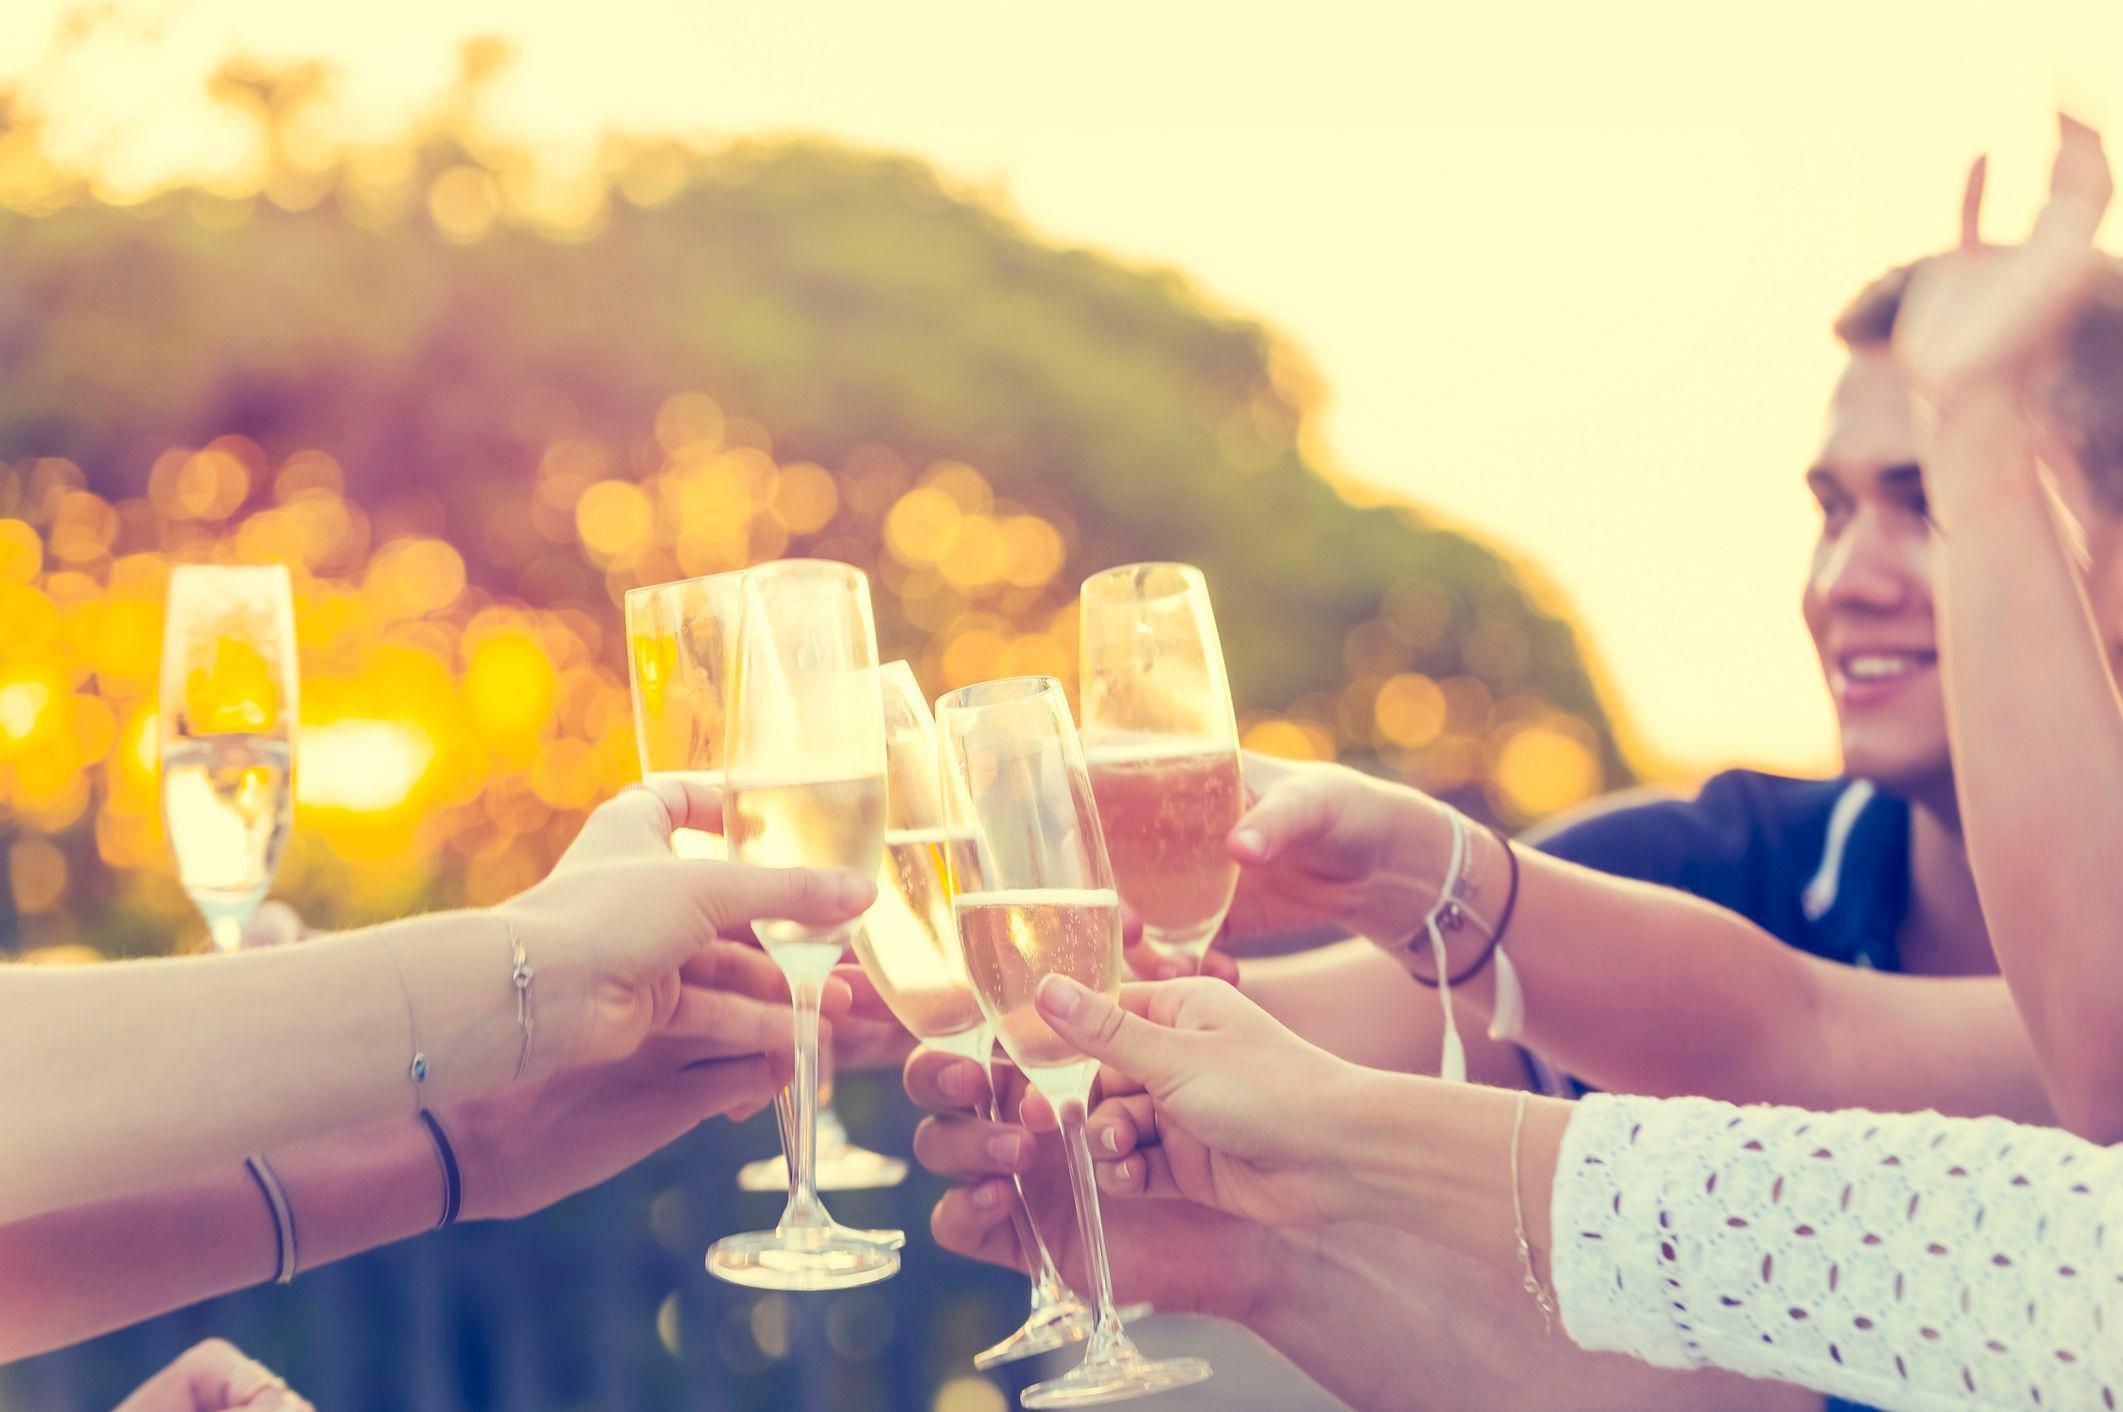 Wine And Diabetes Mayo Clinic